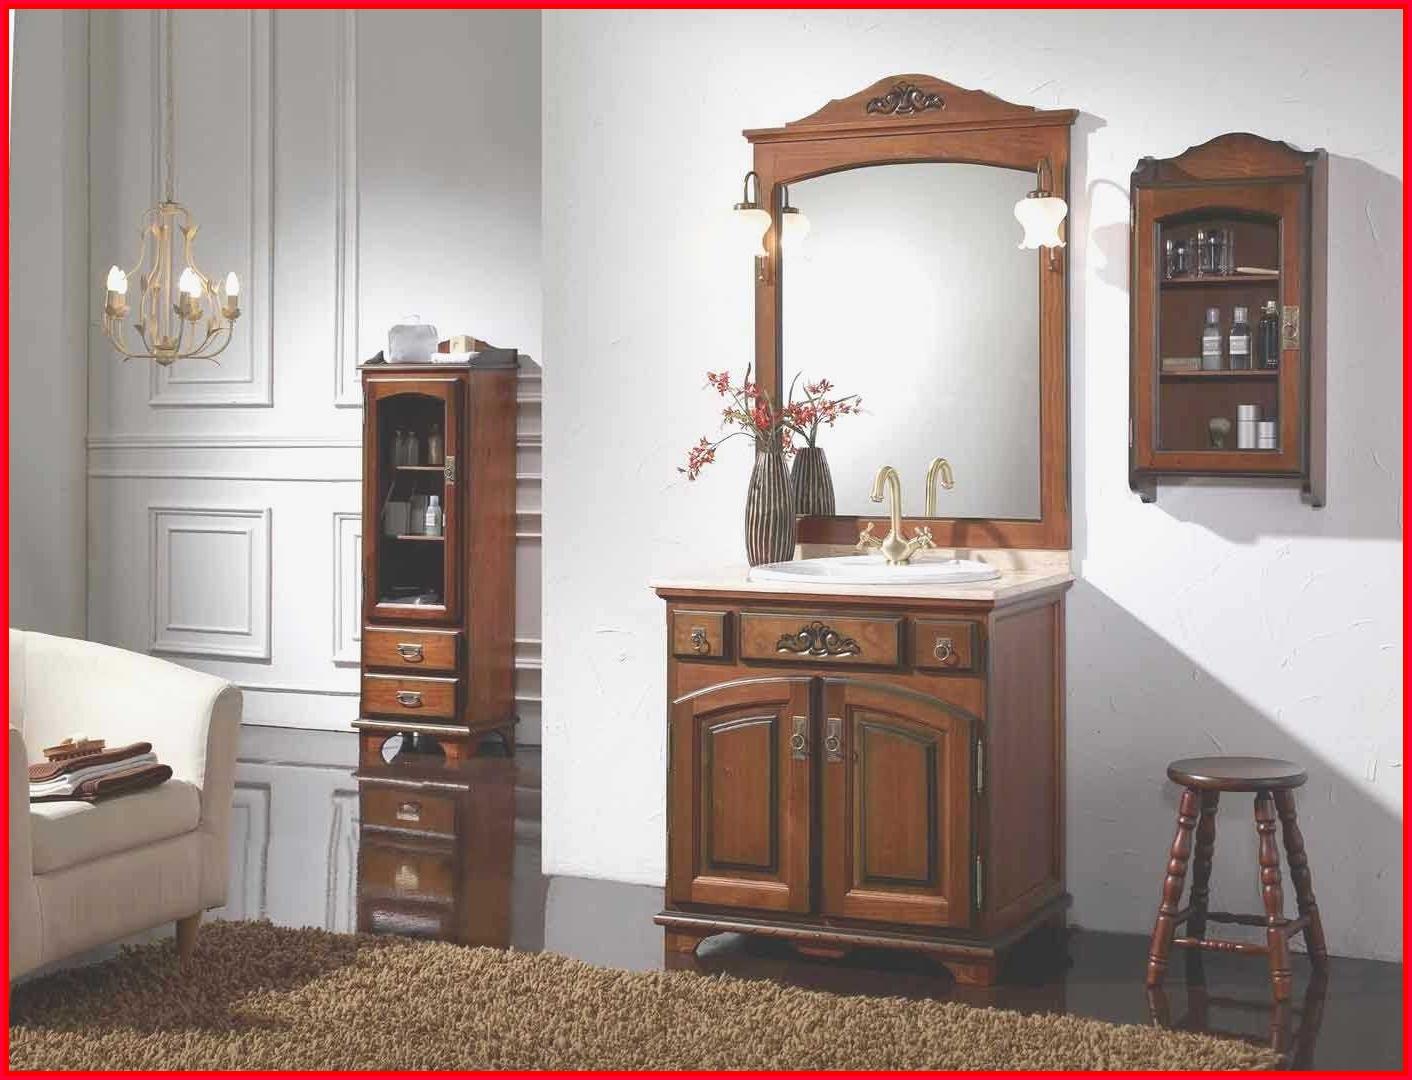 Muebles De Baño Madera E9dx Muebles Baà O Madera Muebles De BaO Rustico Muebles Para Ba O